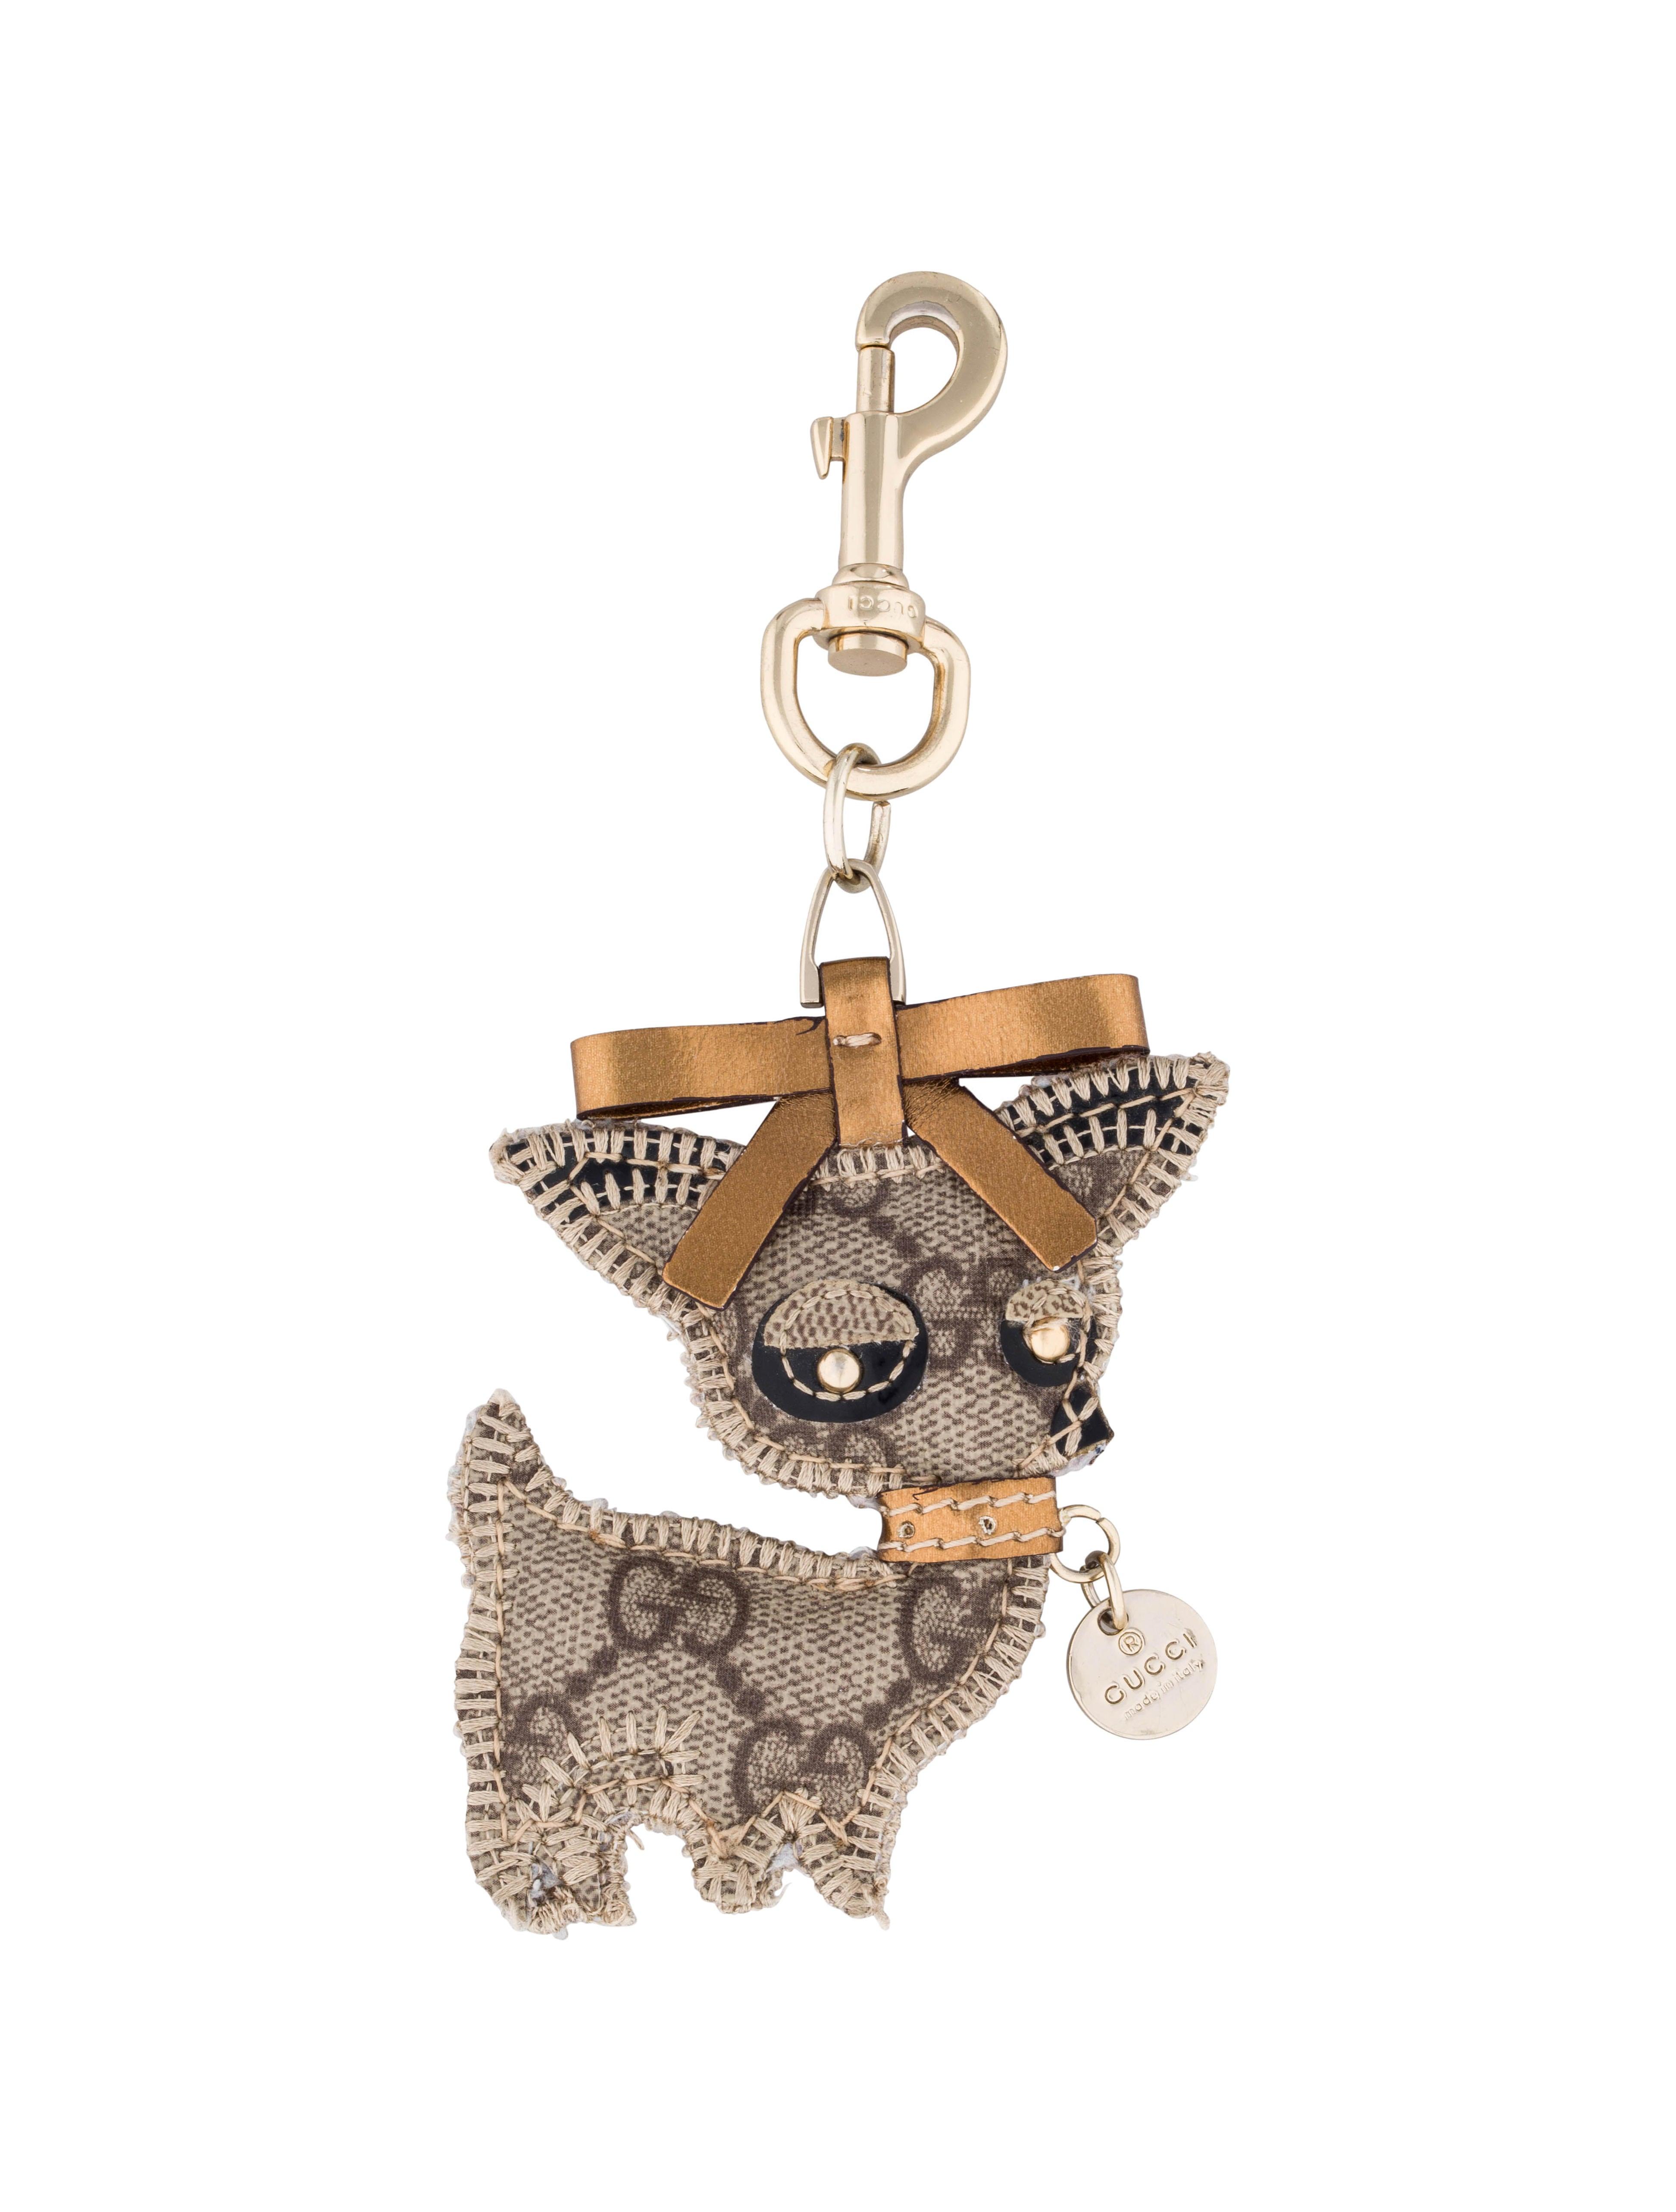 Gucci Chihuahua Keychain Accessories Guc48130 The Realreal